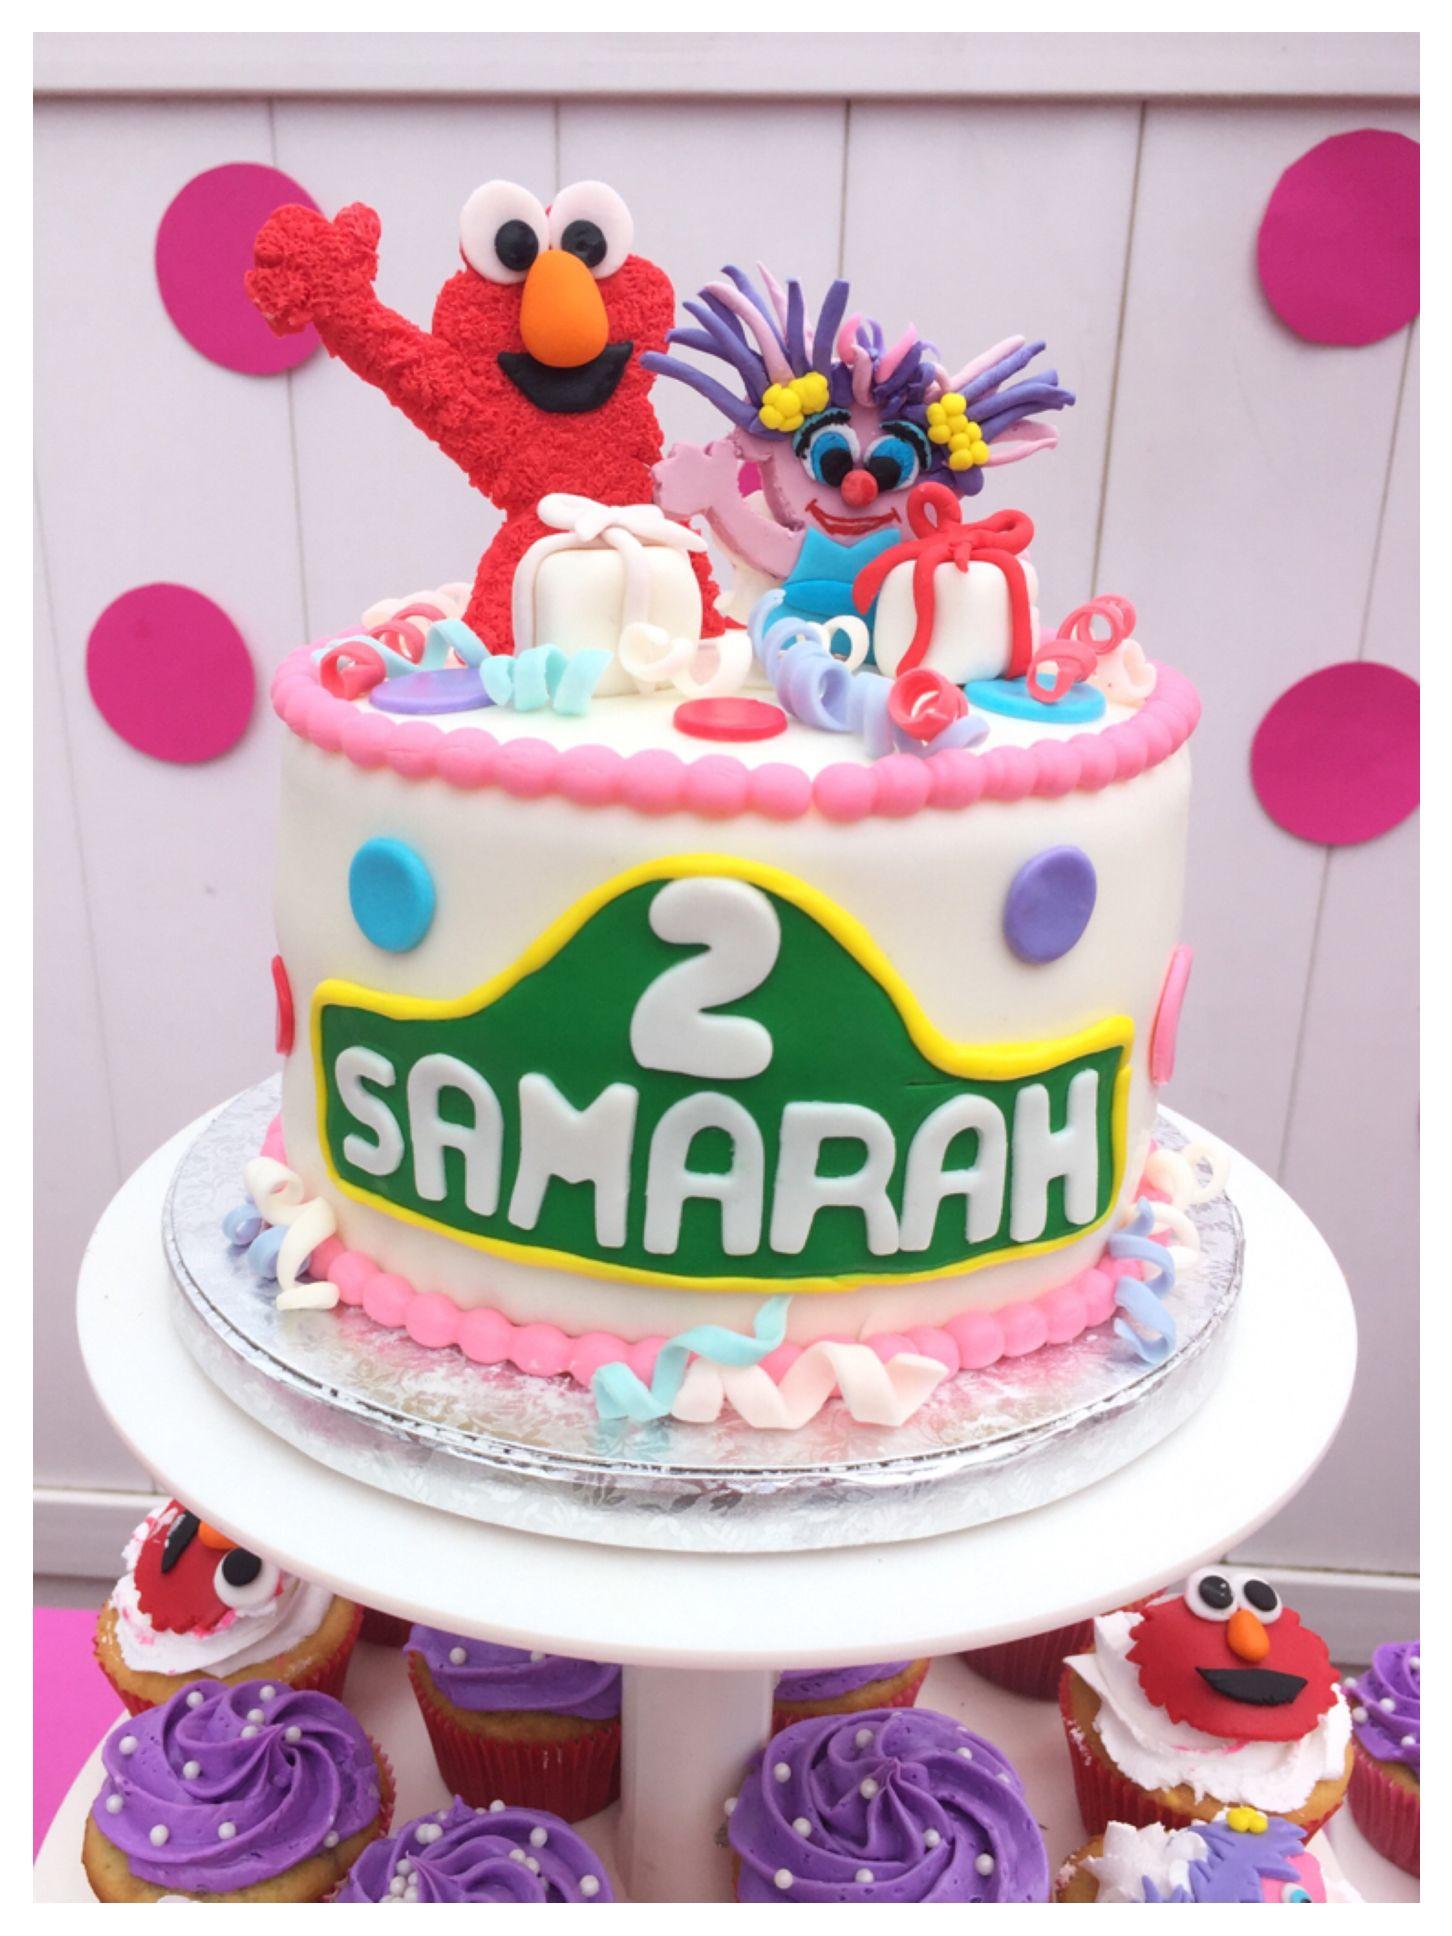 Excellent Elmo And Abby Cadabby Cake Samarahs 2Nd Birthday Elmo Funny Birthday Cards Online Necthendildamsfinfo